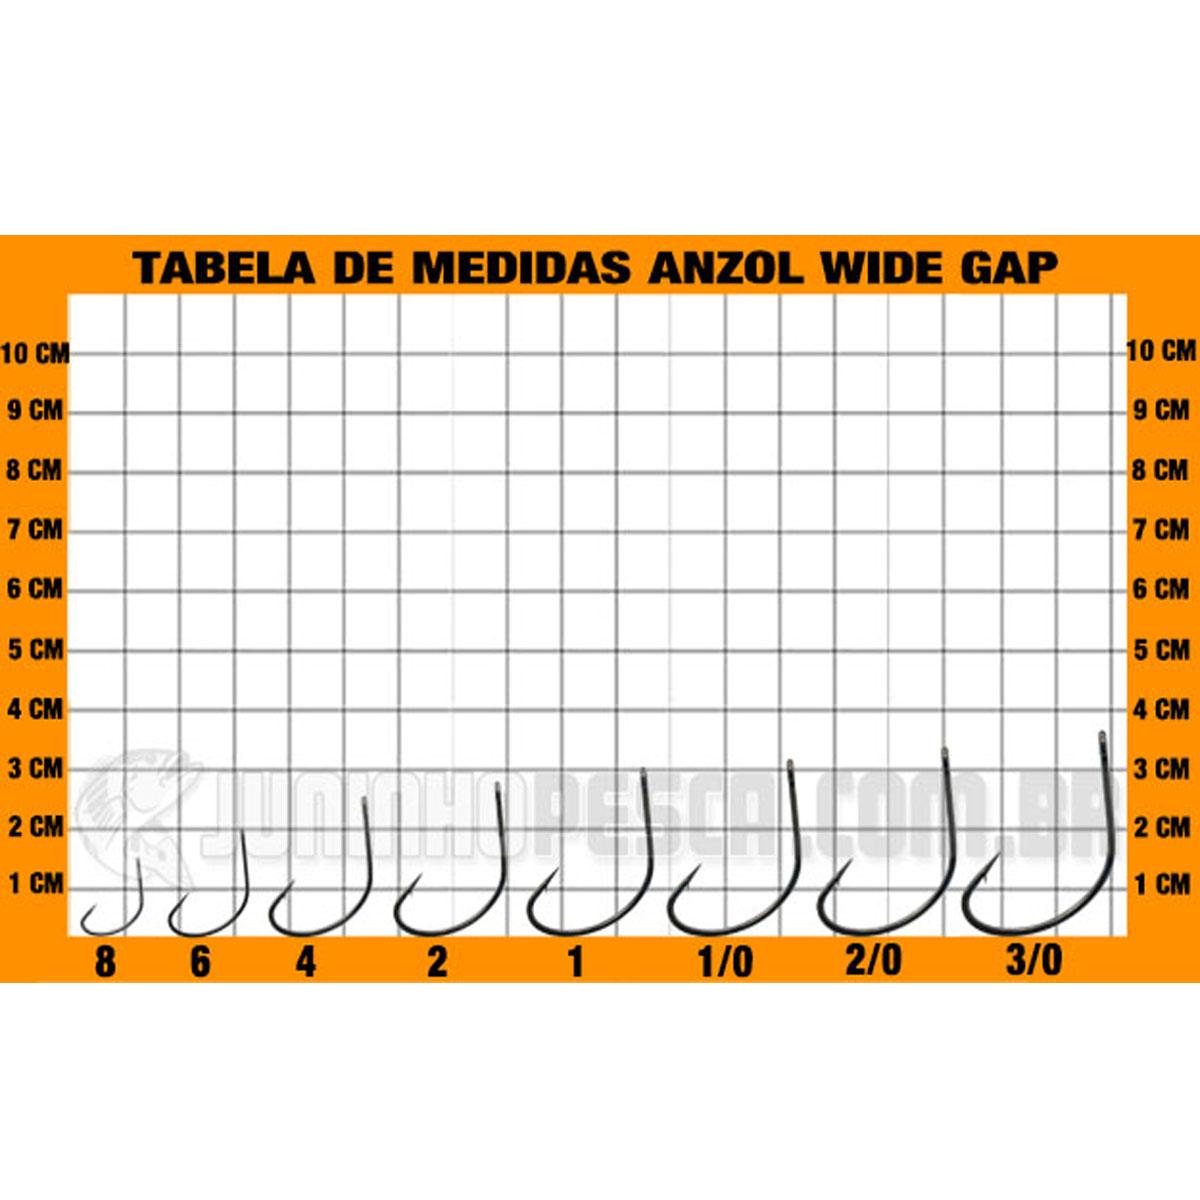 Anzol Pinnacle Wide Gap nº 06  - Pró Pesca Shop